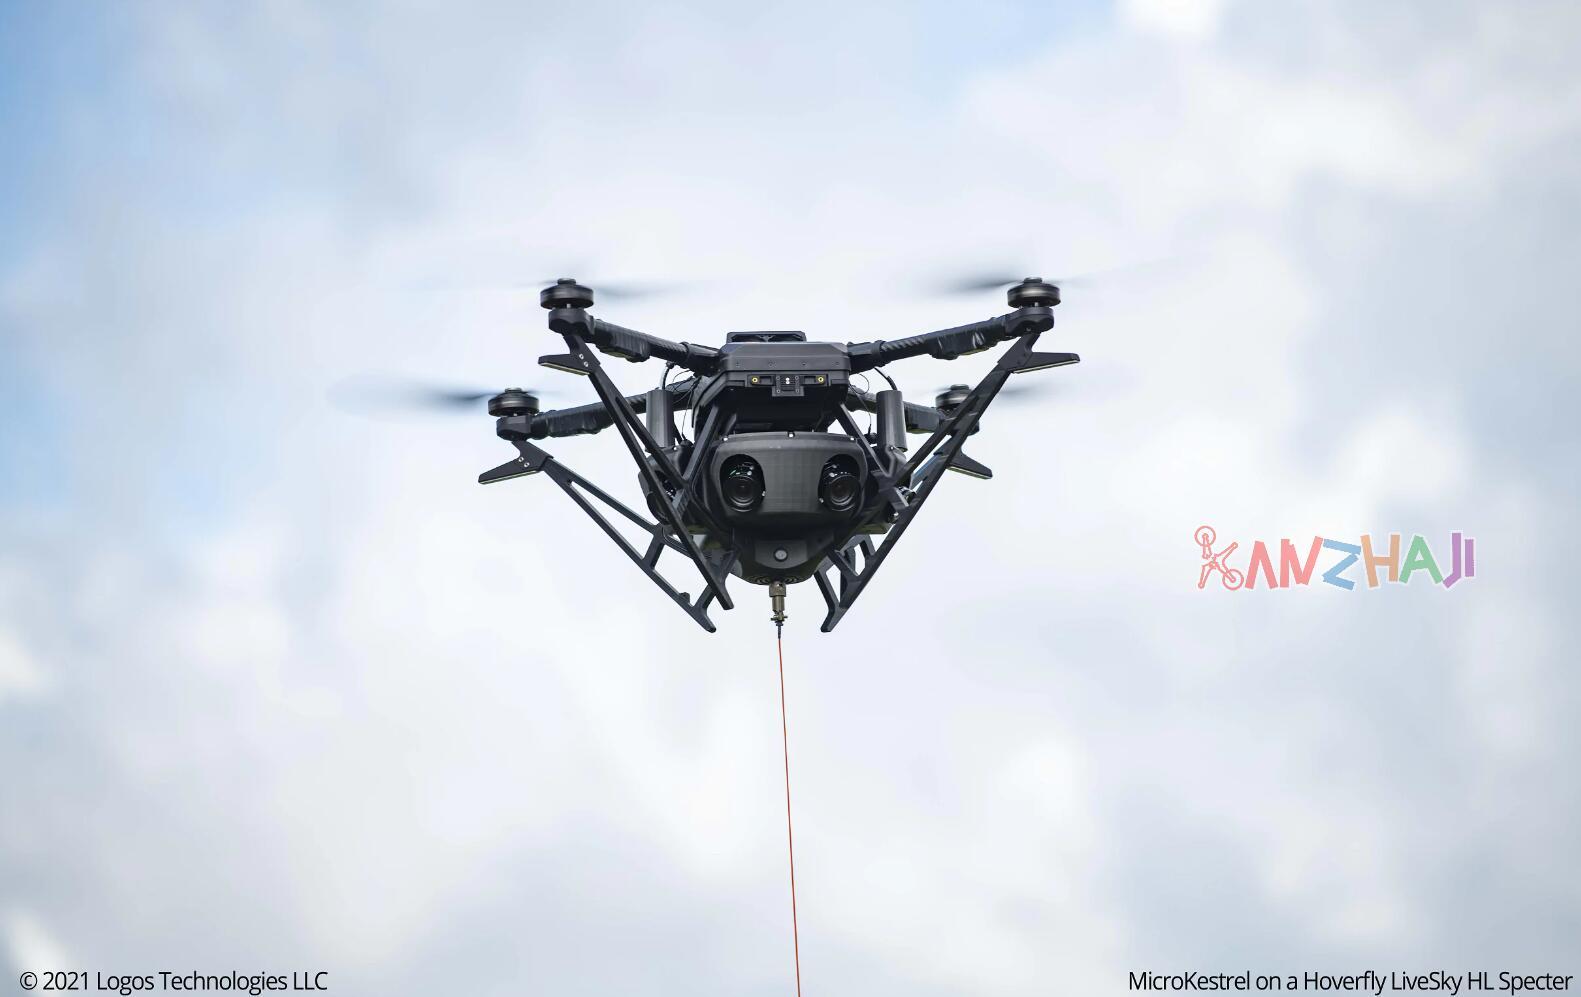 Logos Technologies推出系留无人机用MicroKestrel广域传感器